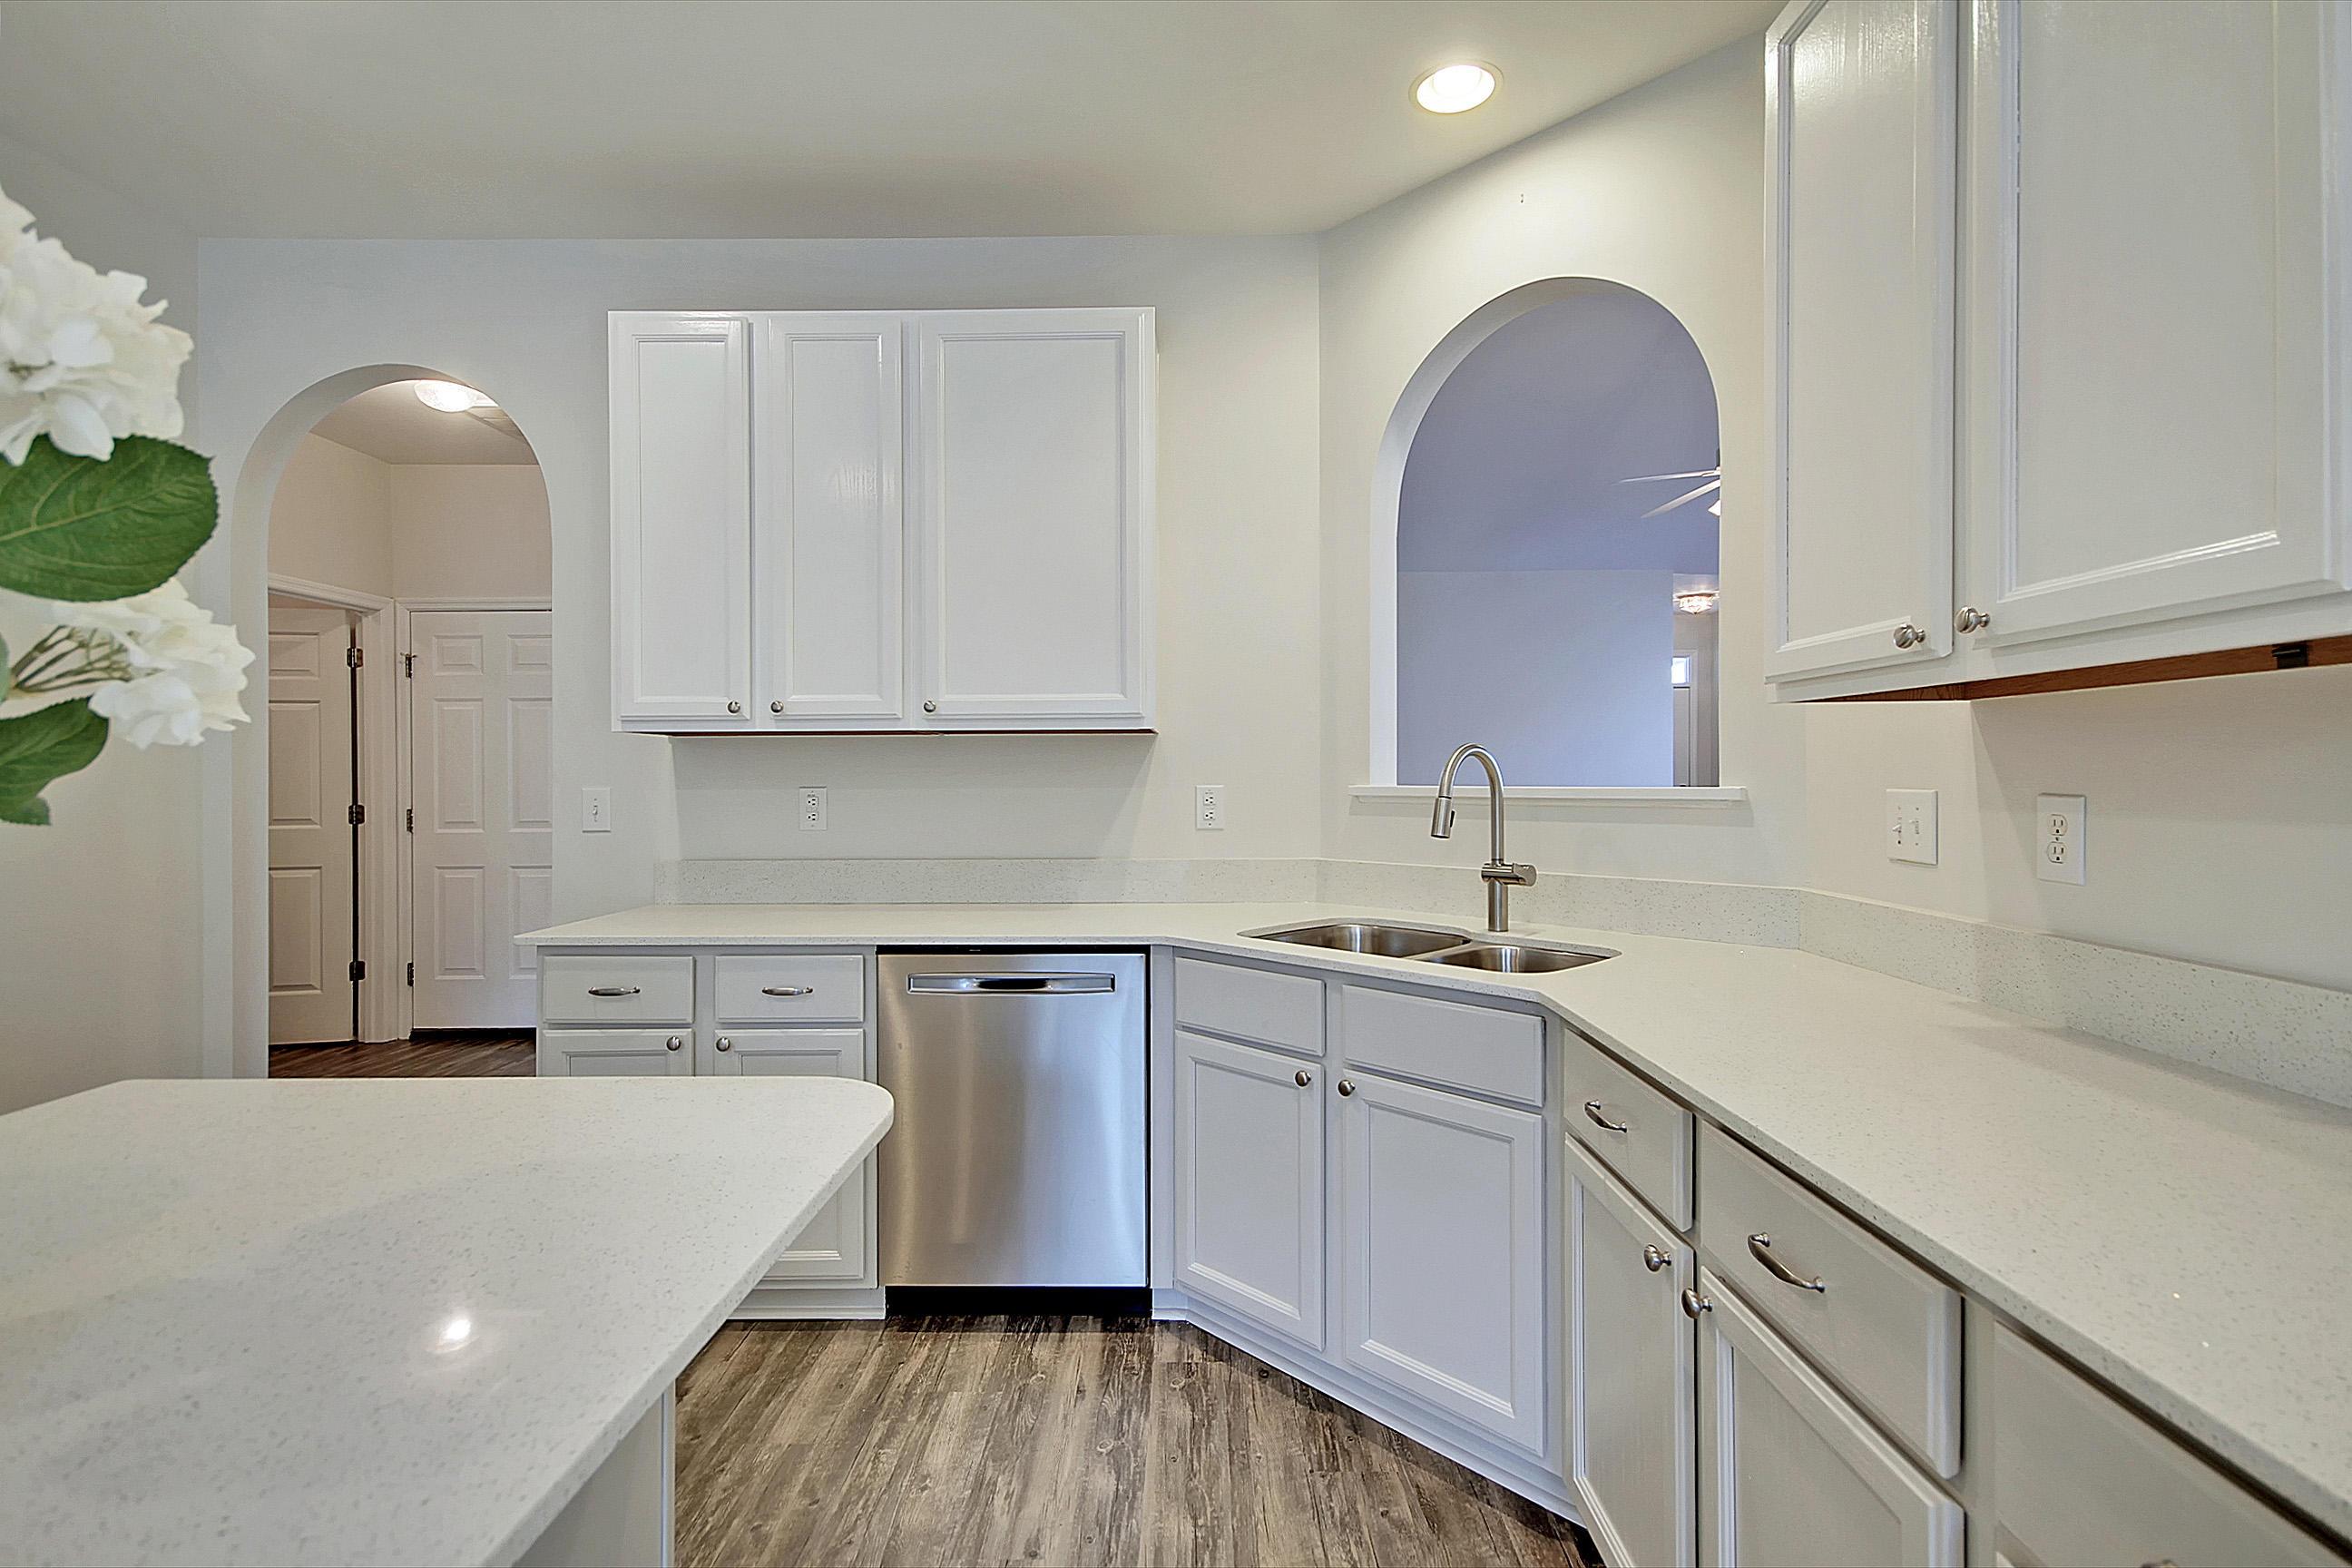 Dunes West Homes For Sale - 2656 Palmetto Hall, Mount Pleasant, SC - 5